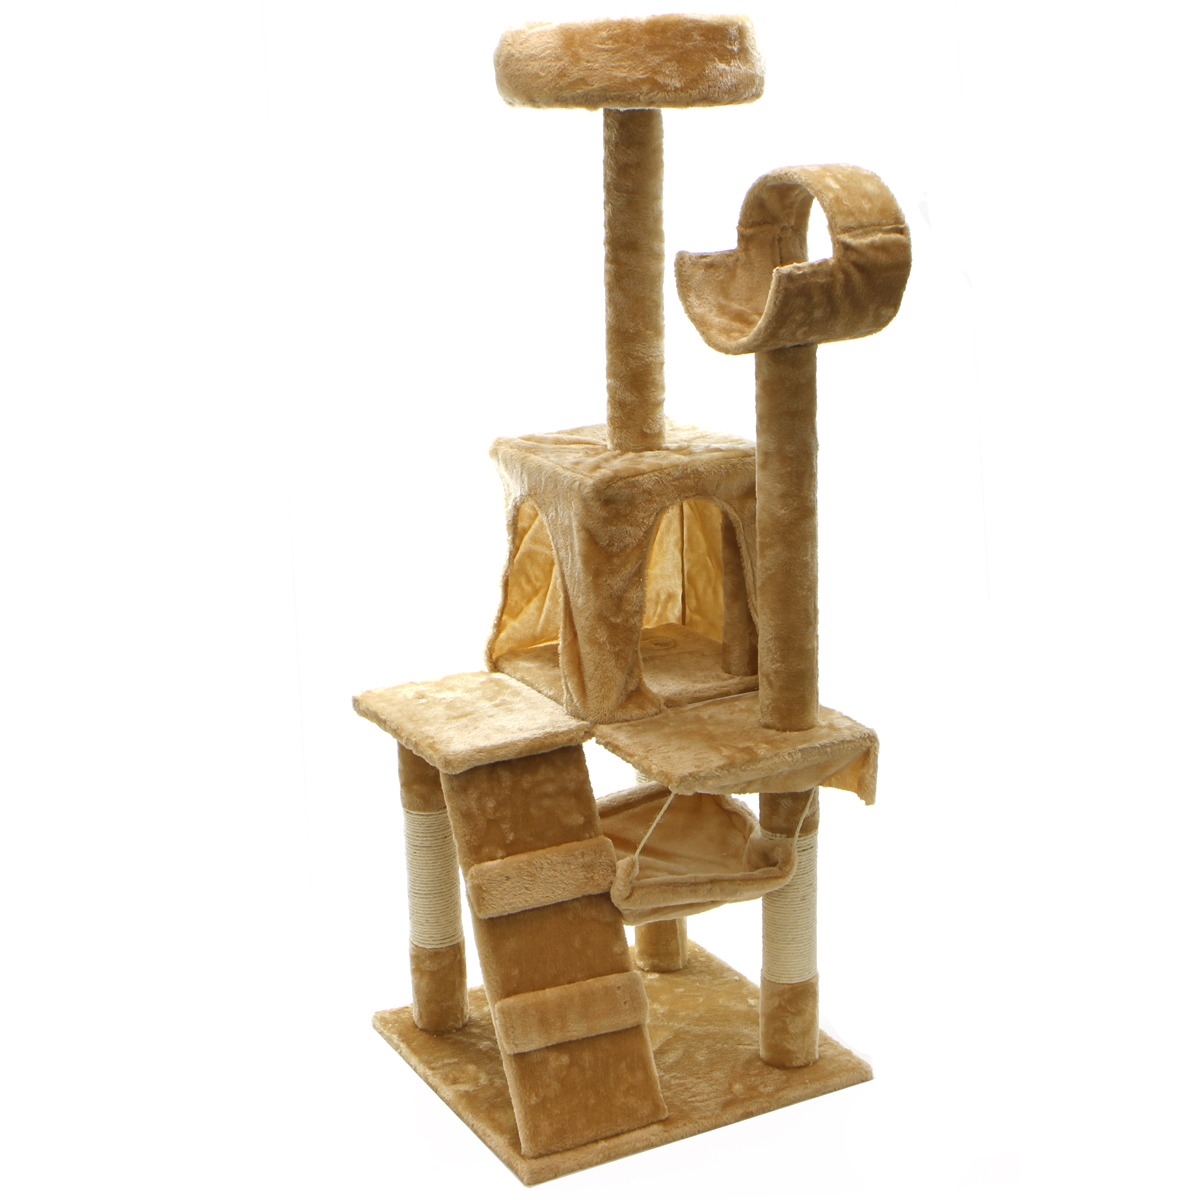 "XtremepowerUS 52"" Condo Cat Tree Scratching Posts Cat Hammock House"